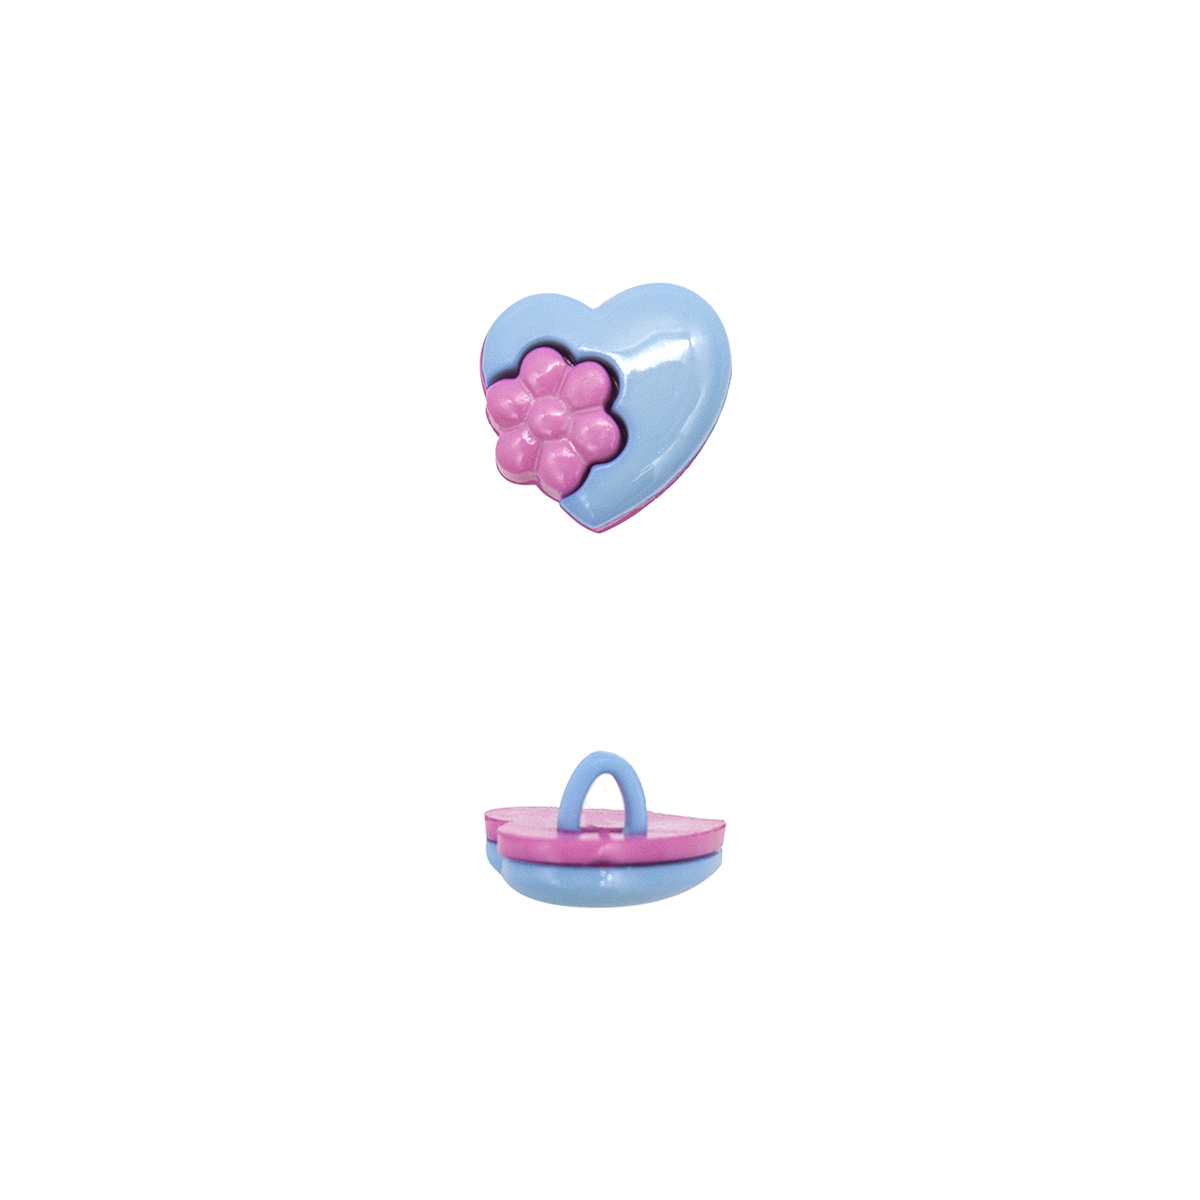 Пуговица, Сердце с цветком (48634) 15мм